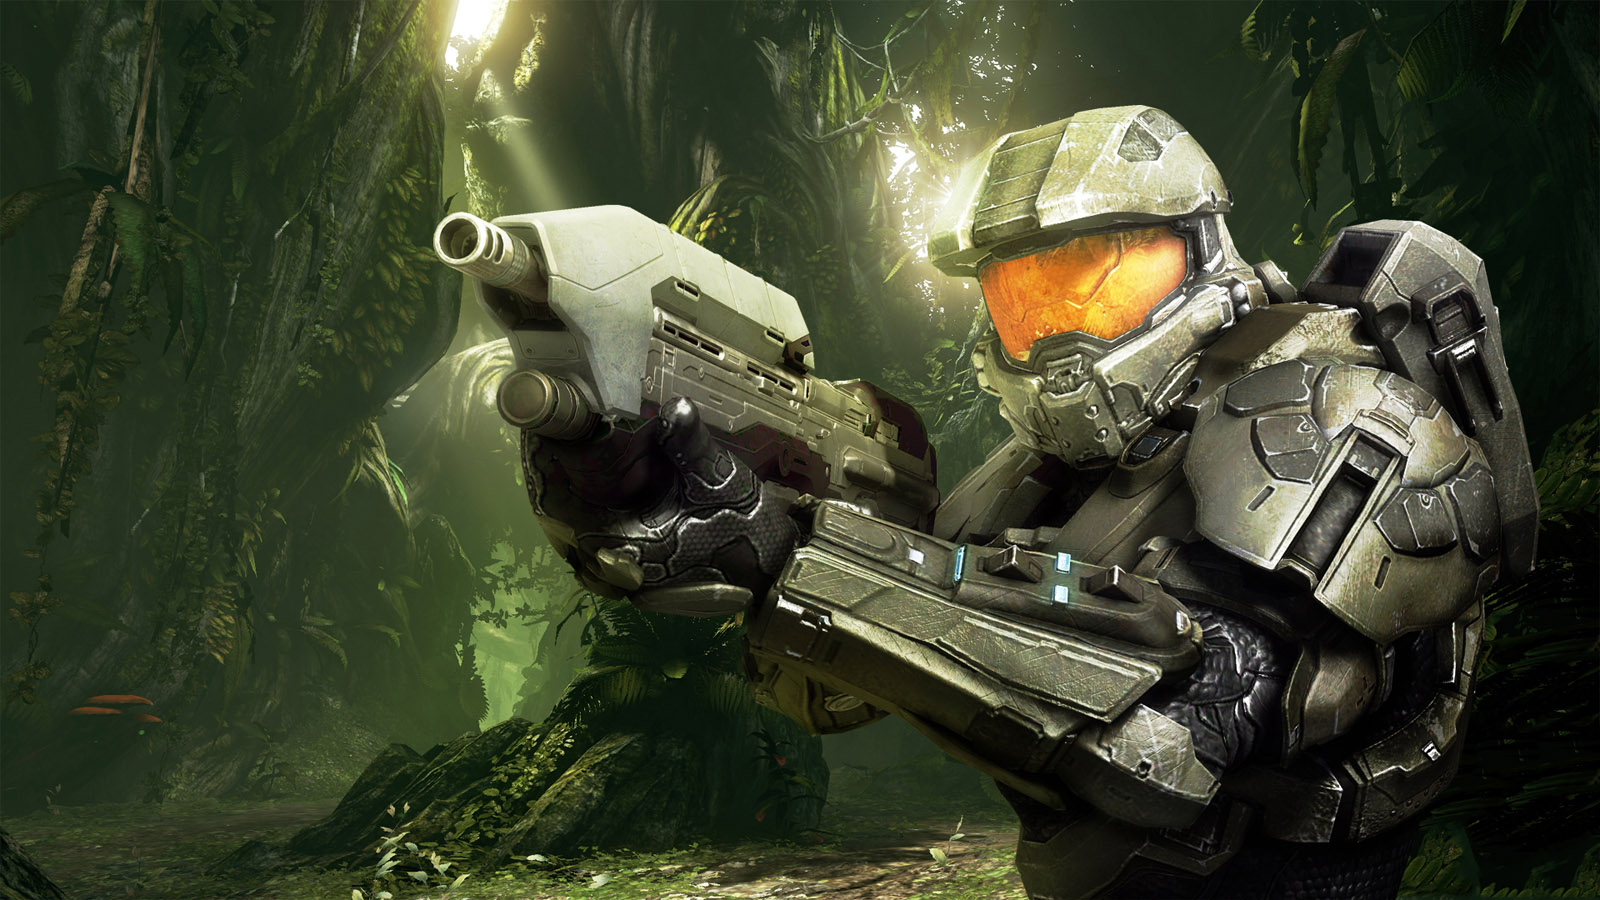 47+] Halo 4 Master Chief Wallpaper on WallpaperSafari